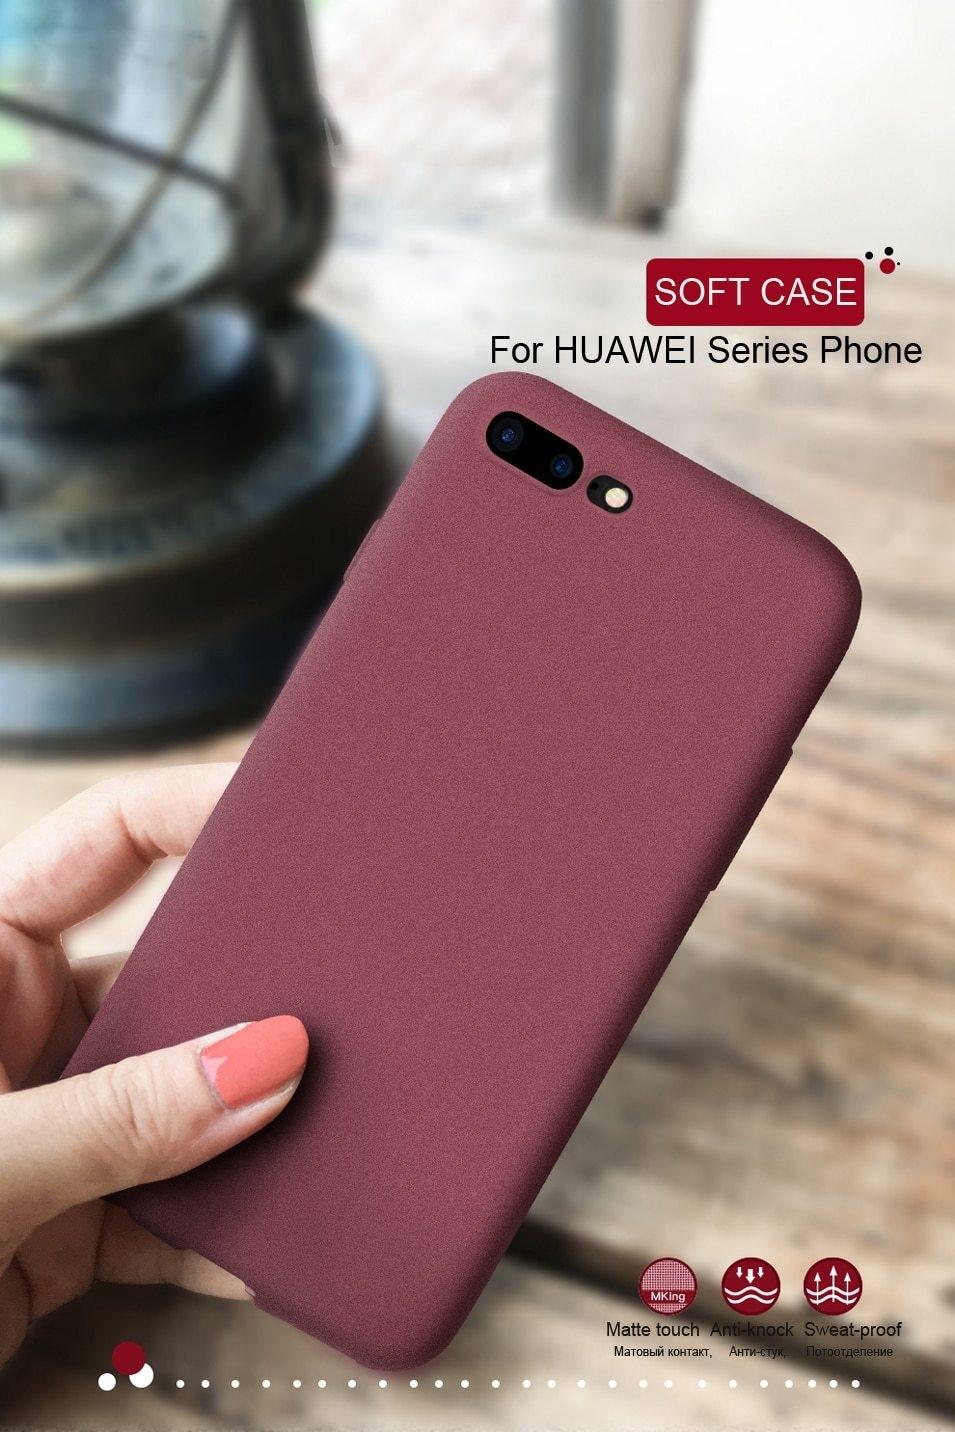 Silicone Soft TPU Matte Case for Huawei P20 P10 Lite P20 Pro P10 P9 P8 Lite 2017 P Smart Nova 2 Plus 2i 2s Case Cover Phone Bag (7)